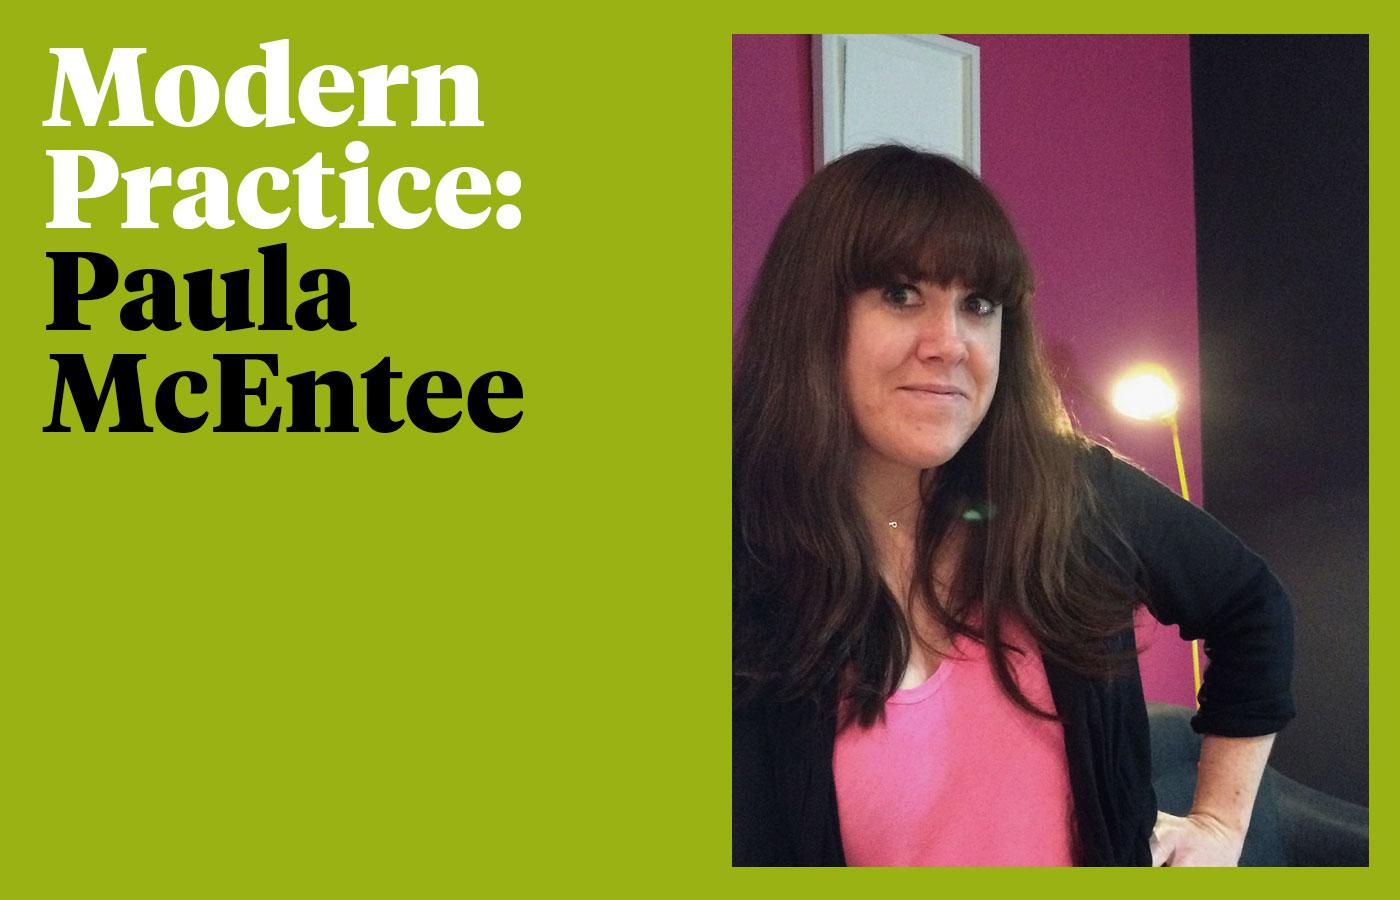 Cover image: Paula McEntee